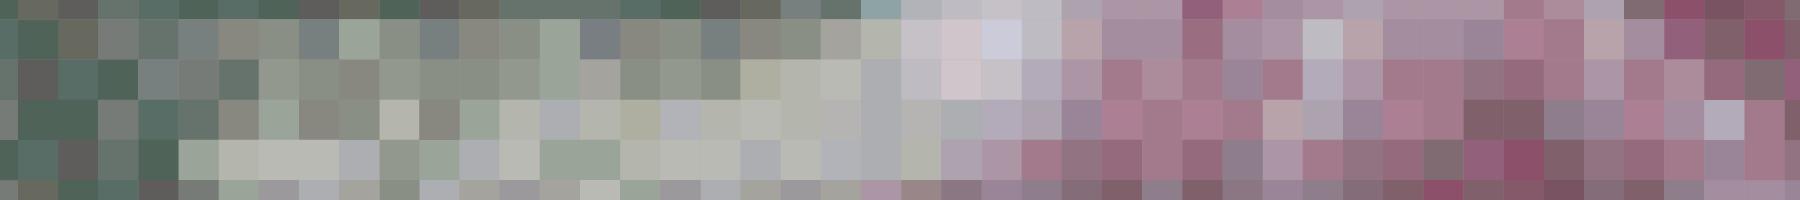 Header Pixels.jpg